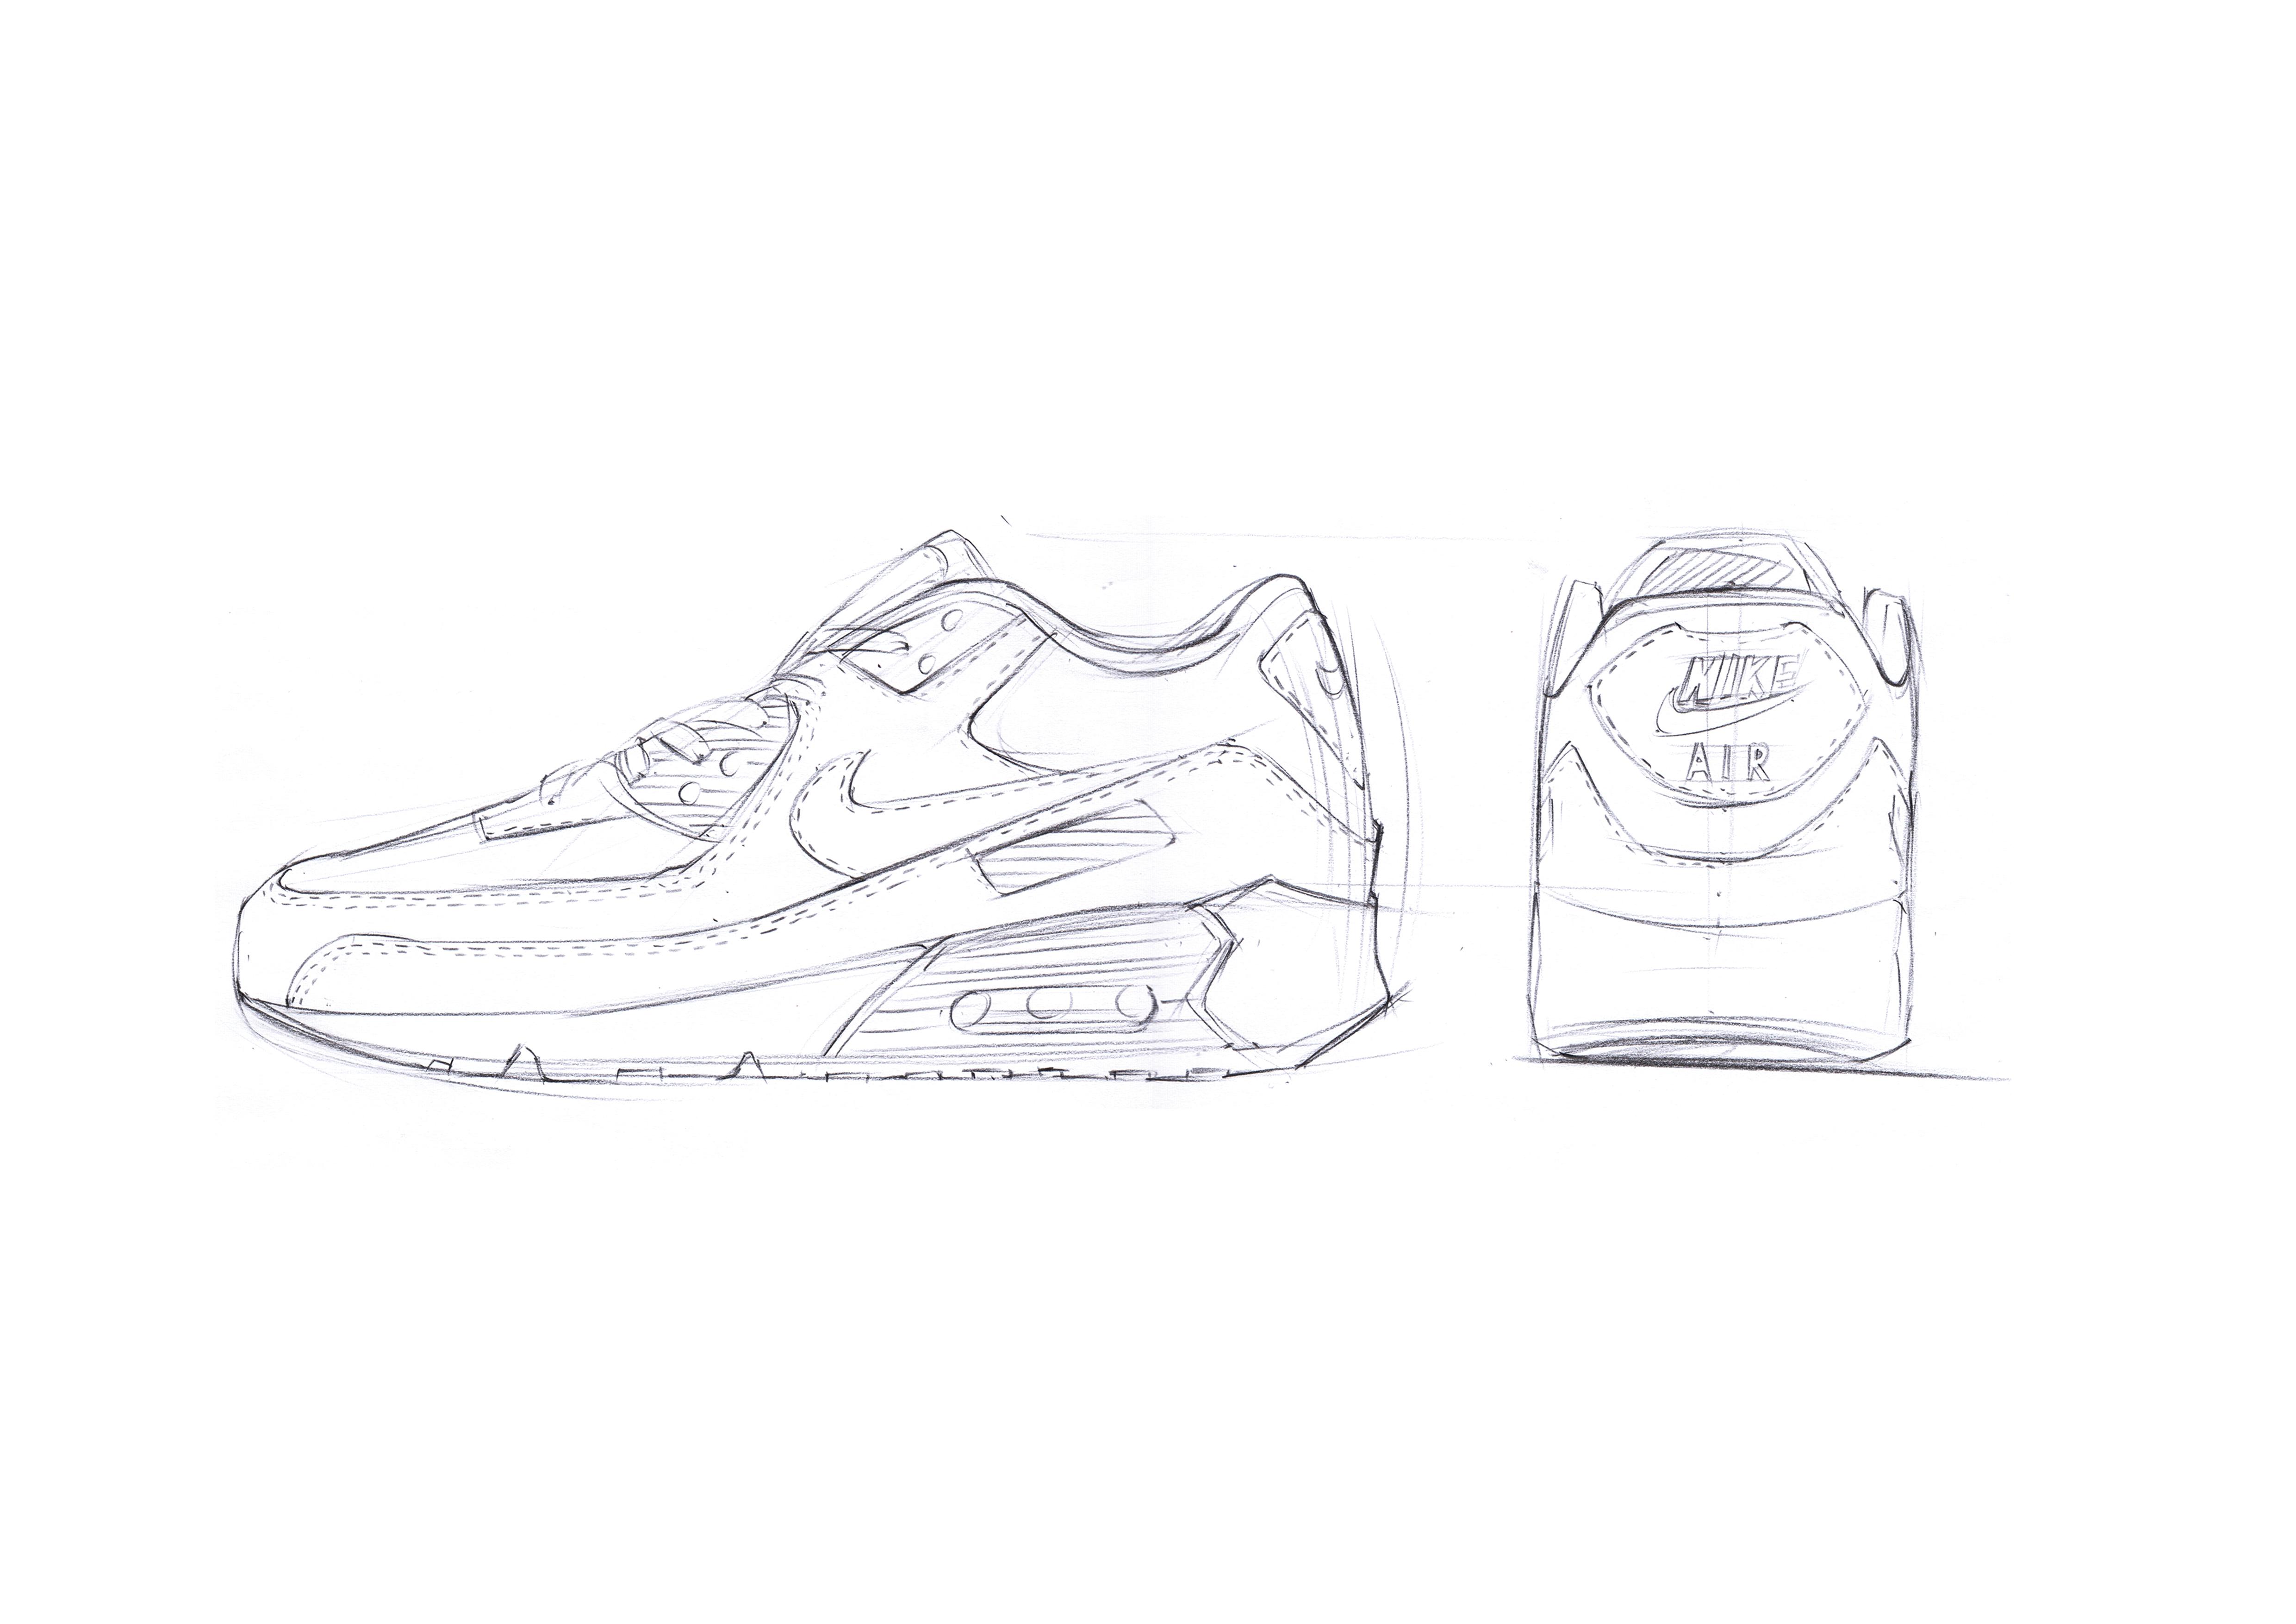 nike运动鞋手绘步鄹|工业/产品|生活用品|马赛mars